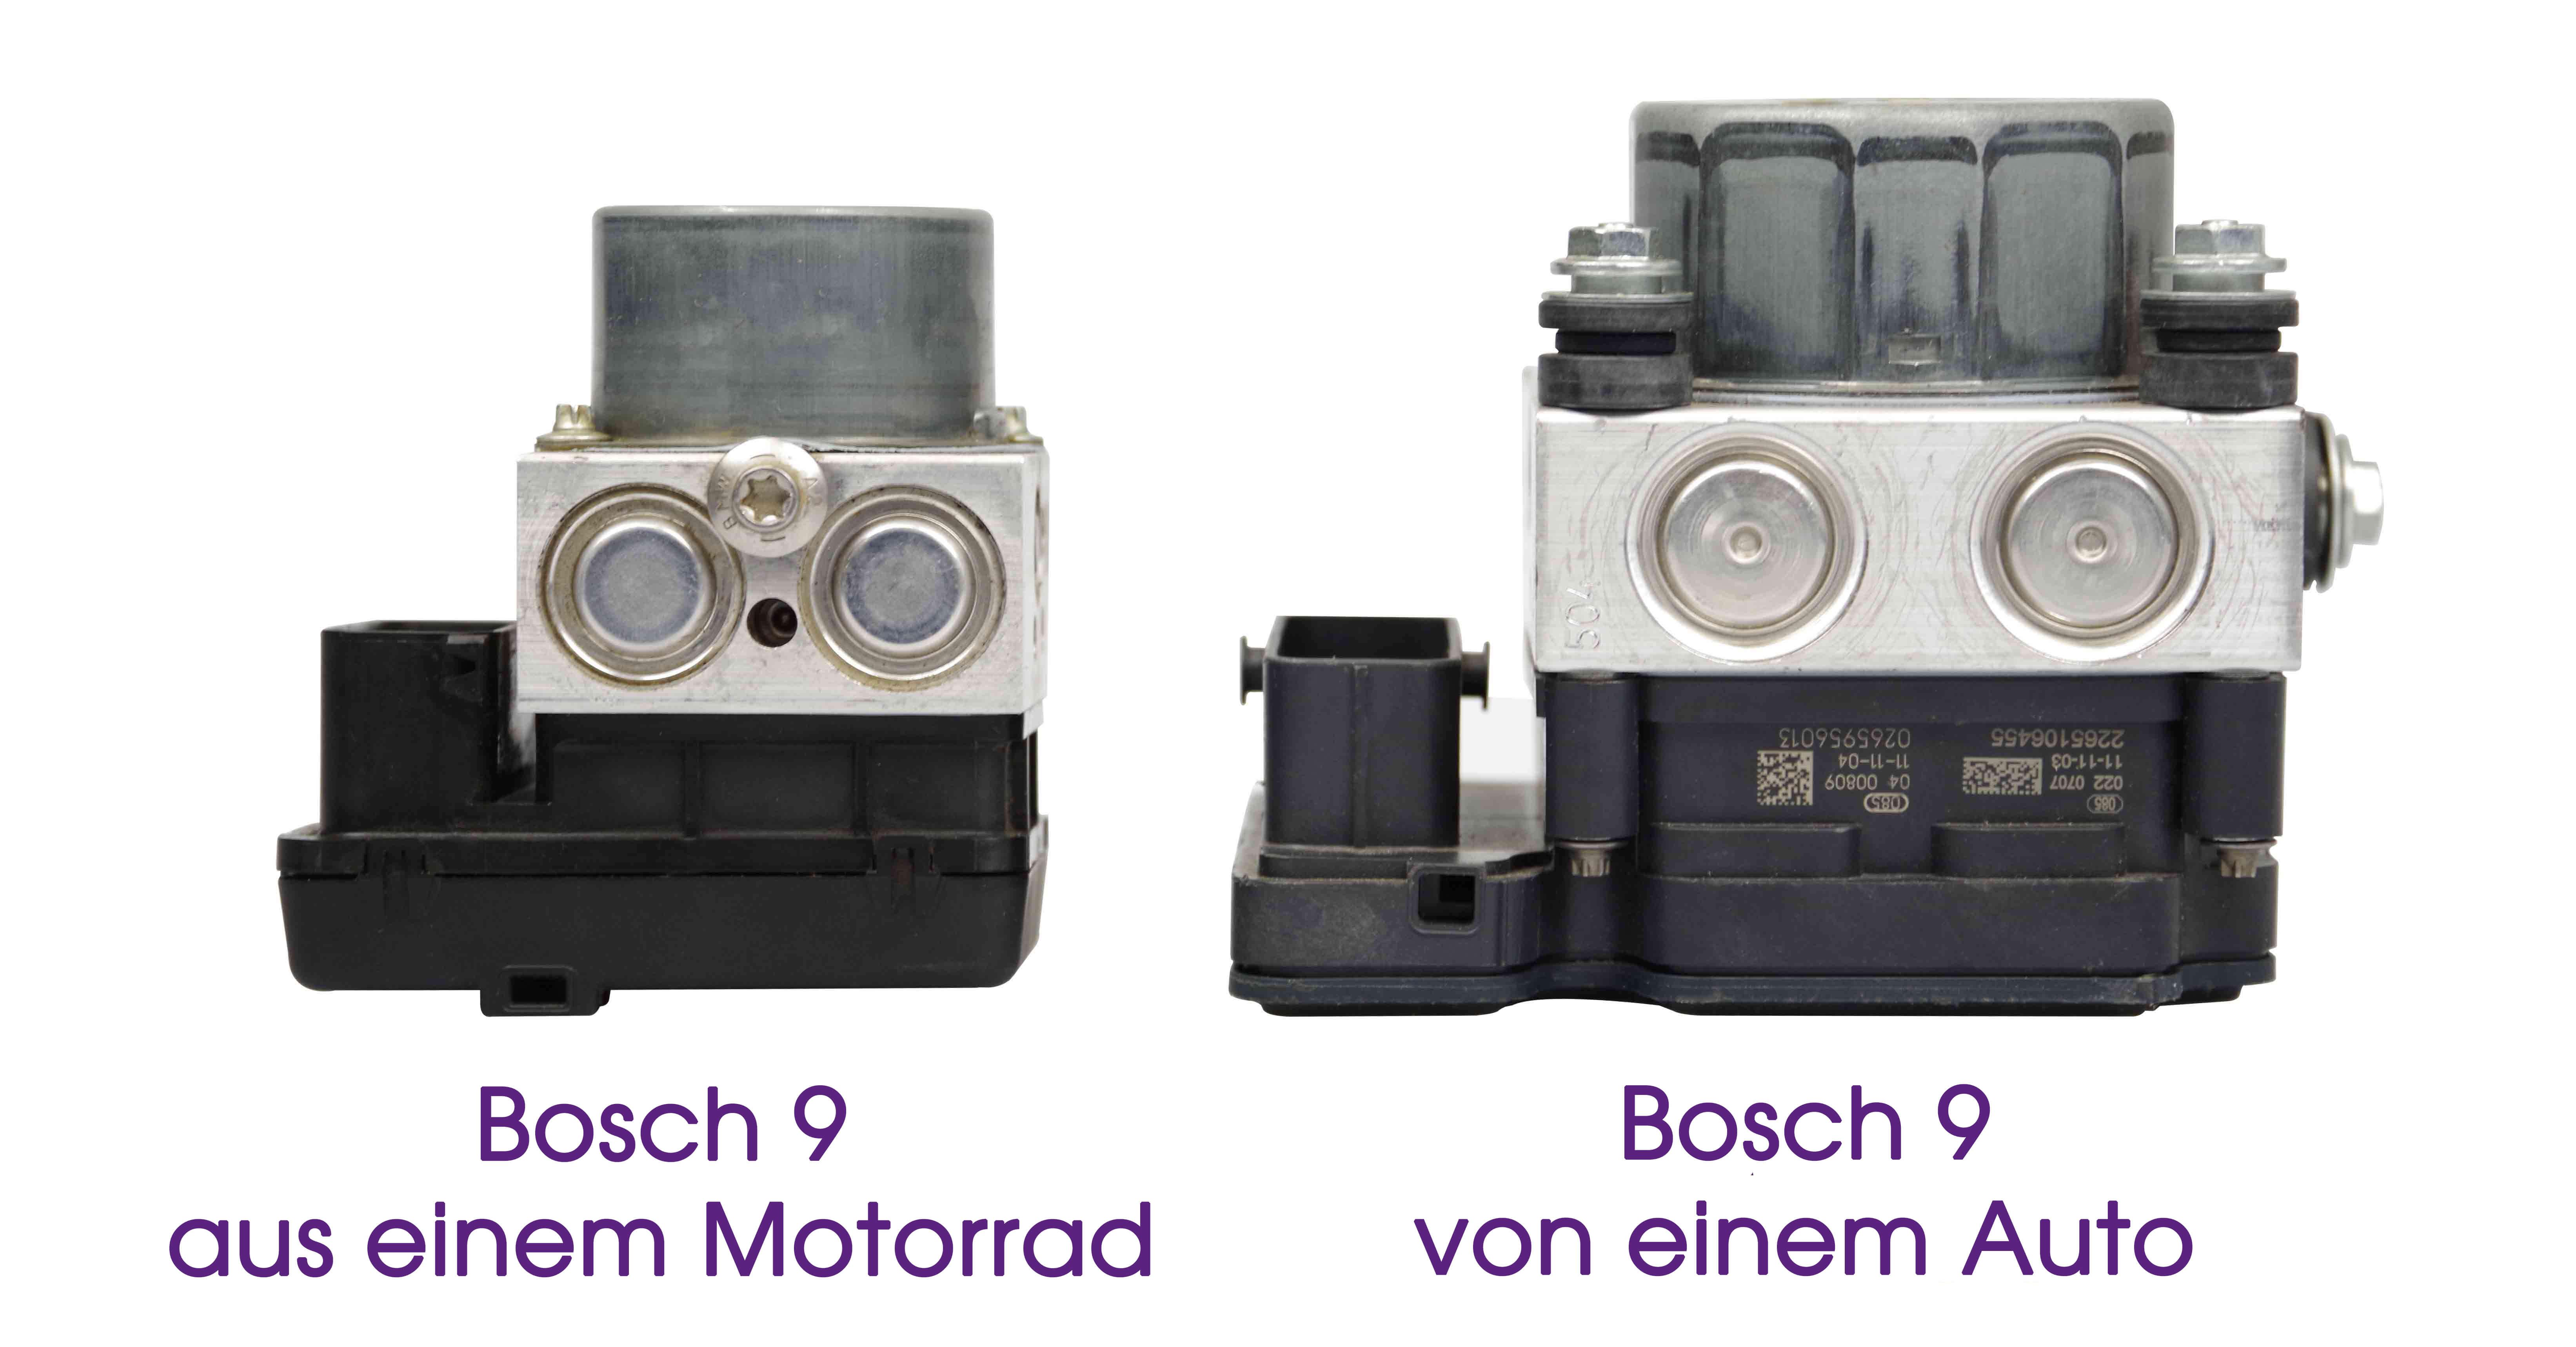 Bosch 8 ABS motorrads